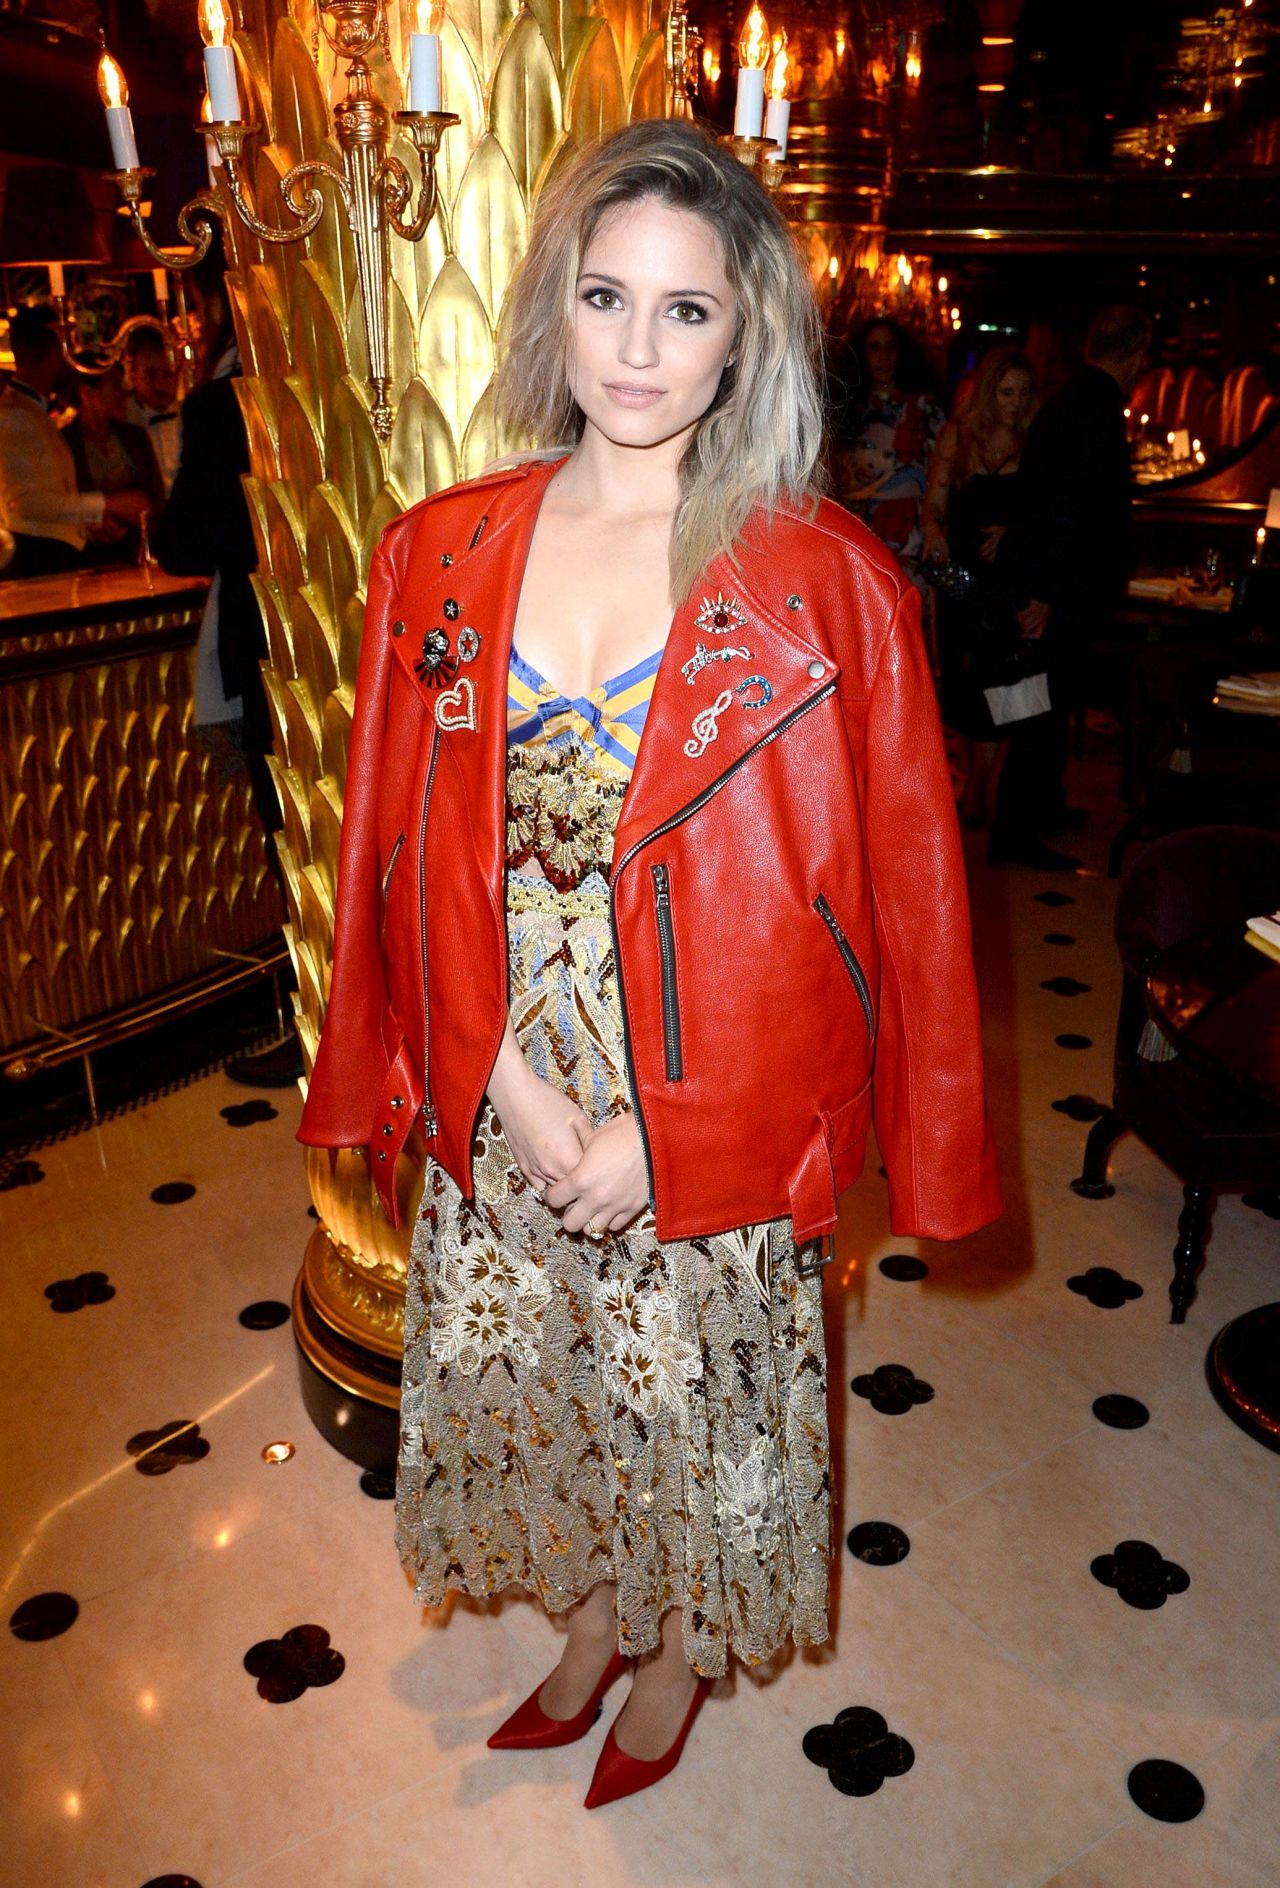 dianna-agron-marc-jacobs-beauty-dinner-london-fashion-week-2-20-2016-2